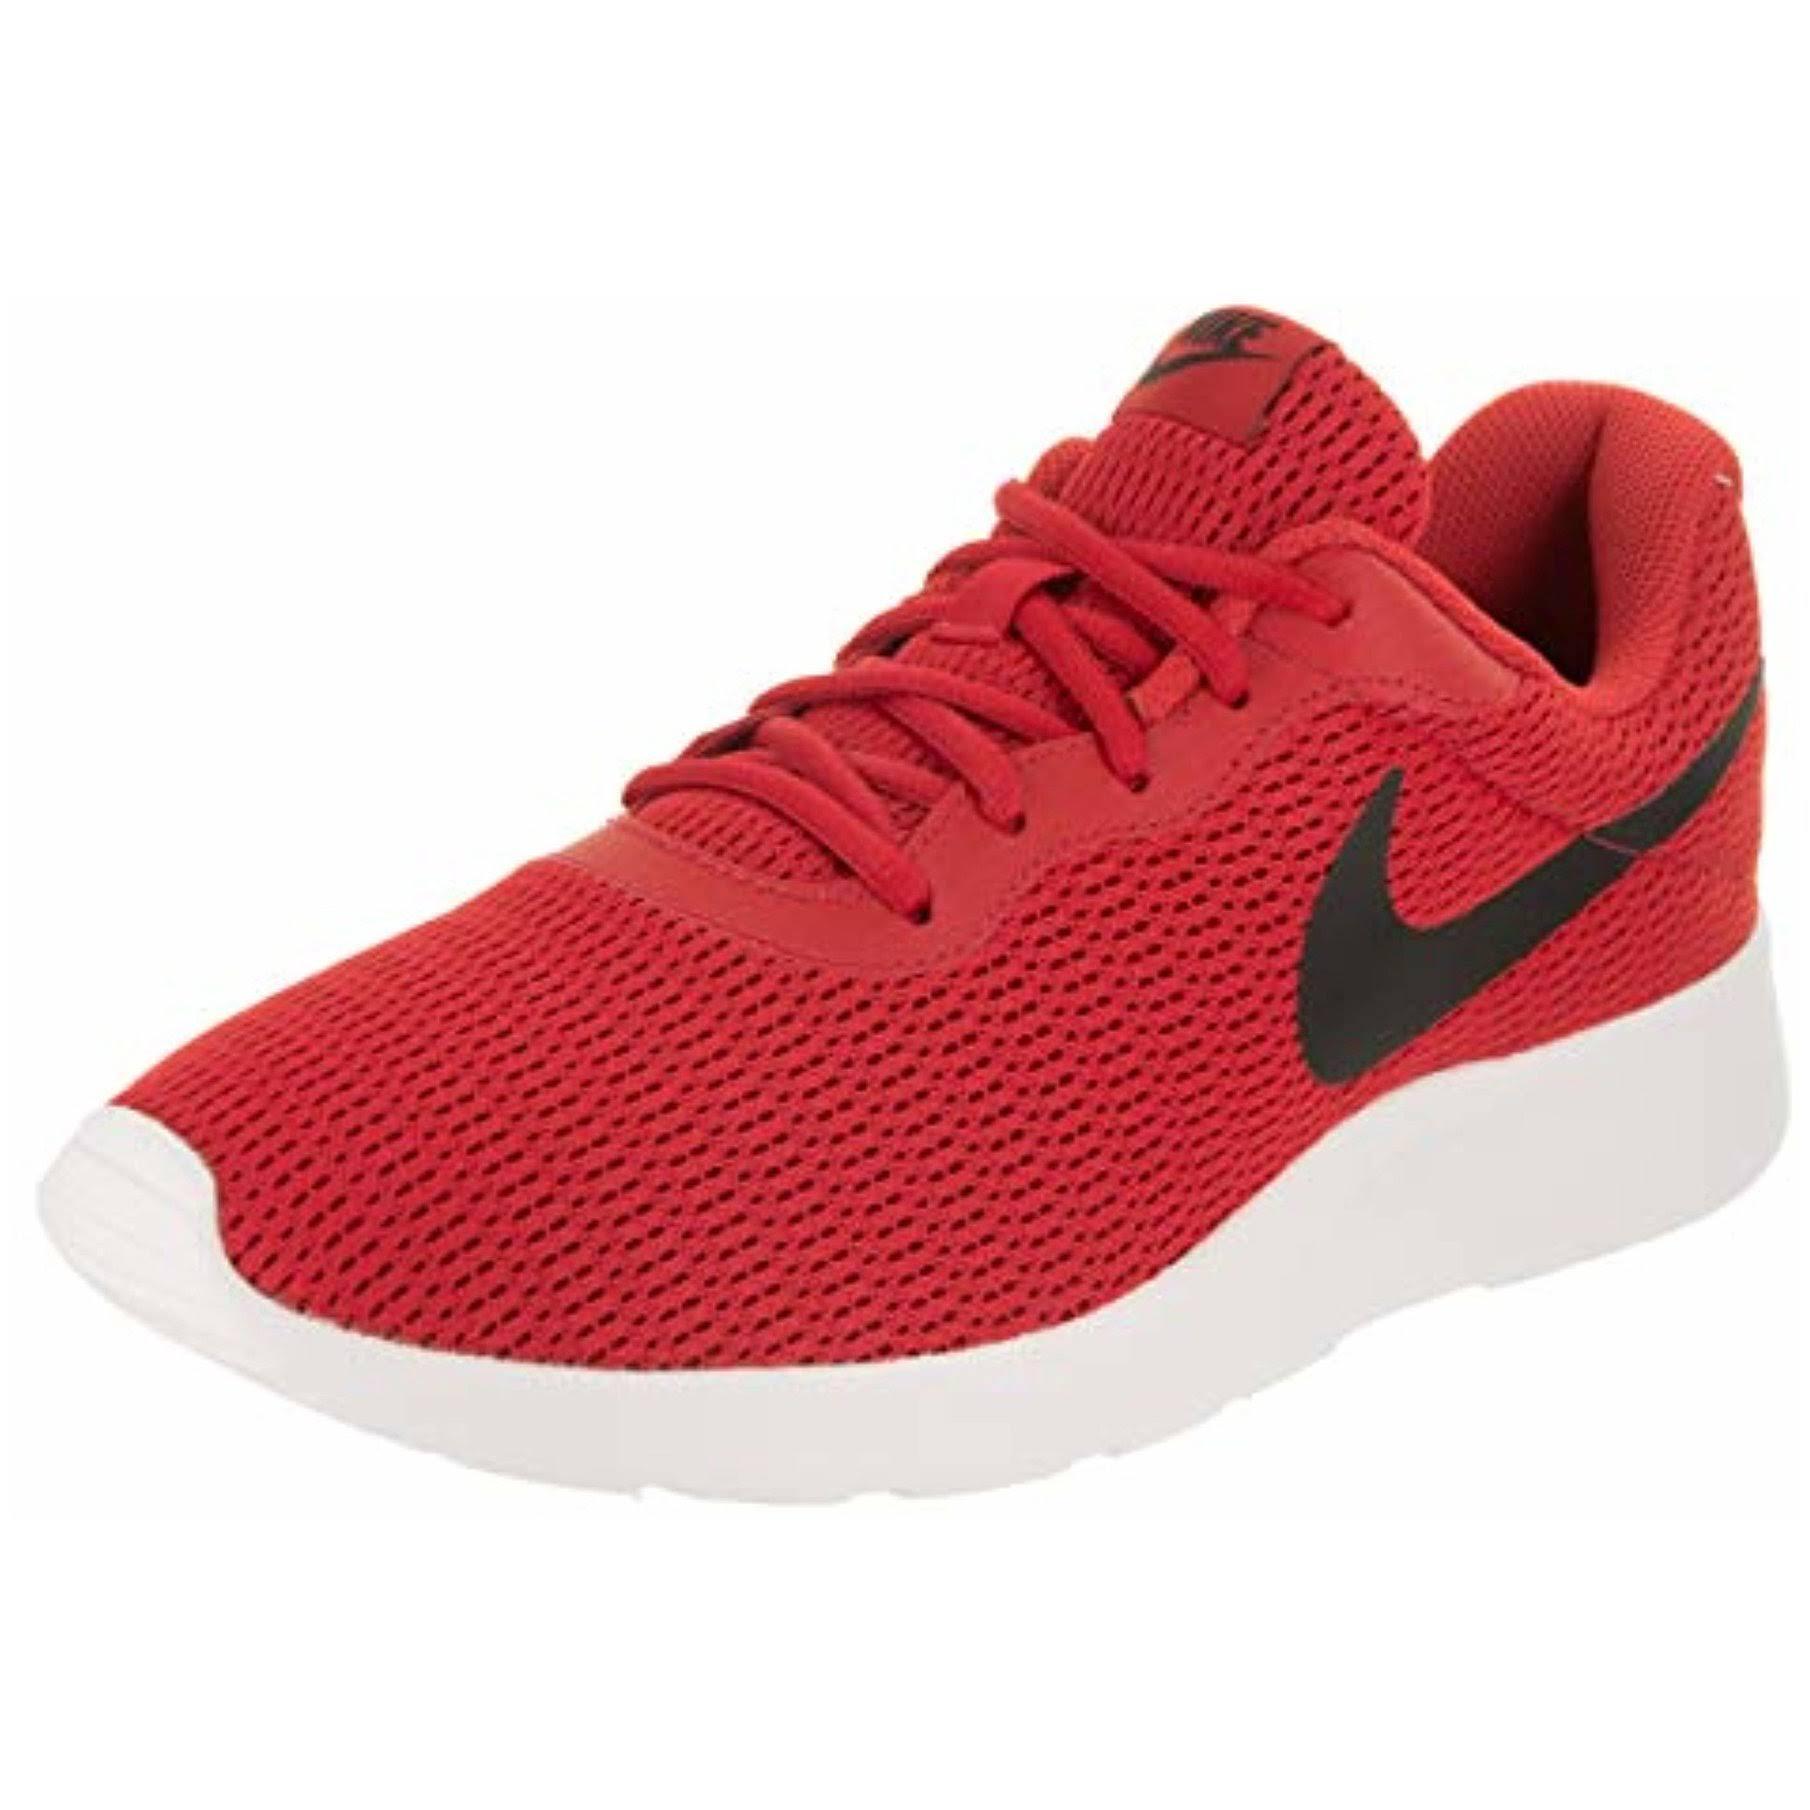 Hombre Meta Casual Rojo De Tanjun Nike Para Univ Línea Negro La 10 Sneakers AHwInqE8R